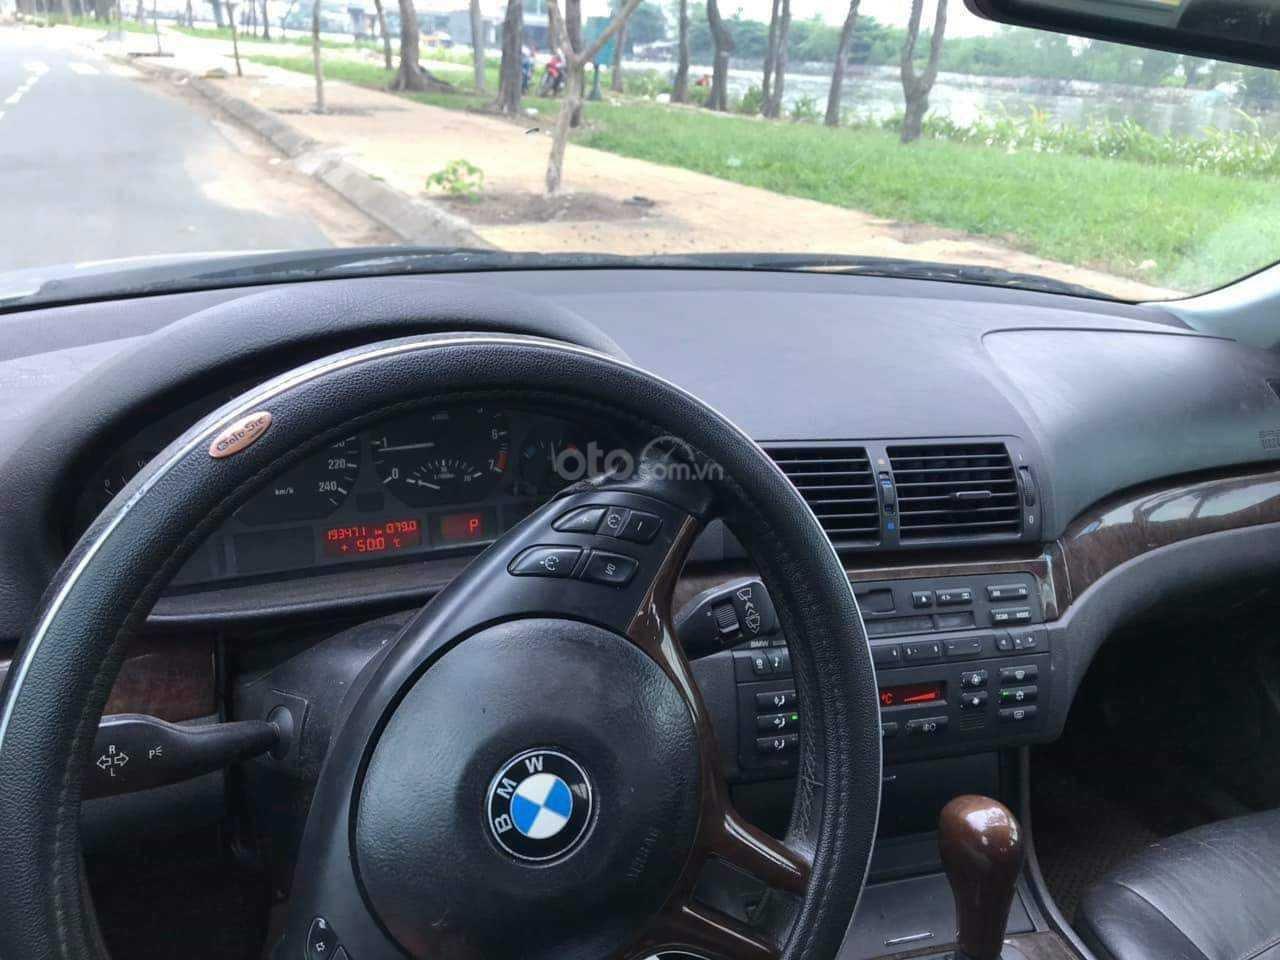 Cần bán BMW 325i Sport date 2003 (6)